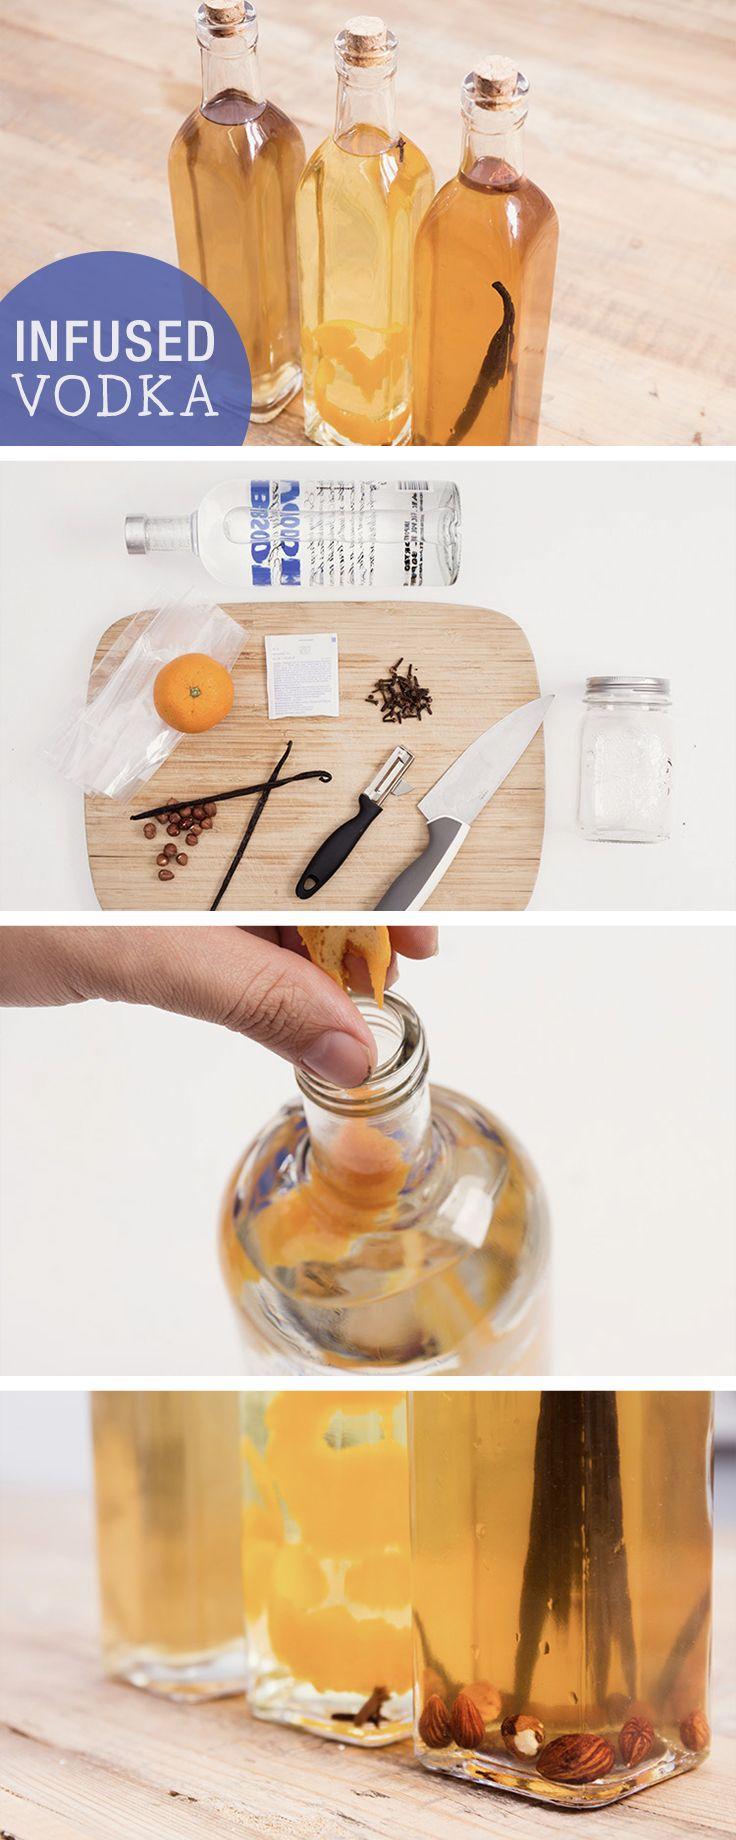 Rezept: Alkoholisches Geschenk, infused Vodka / recipe for infused vodka, gift idea via DaWanda.com